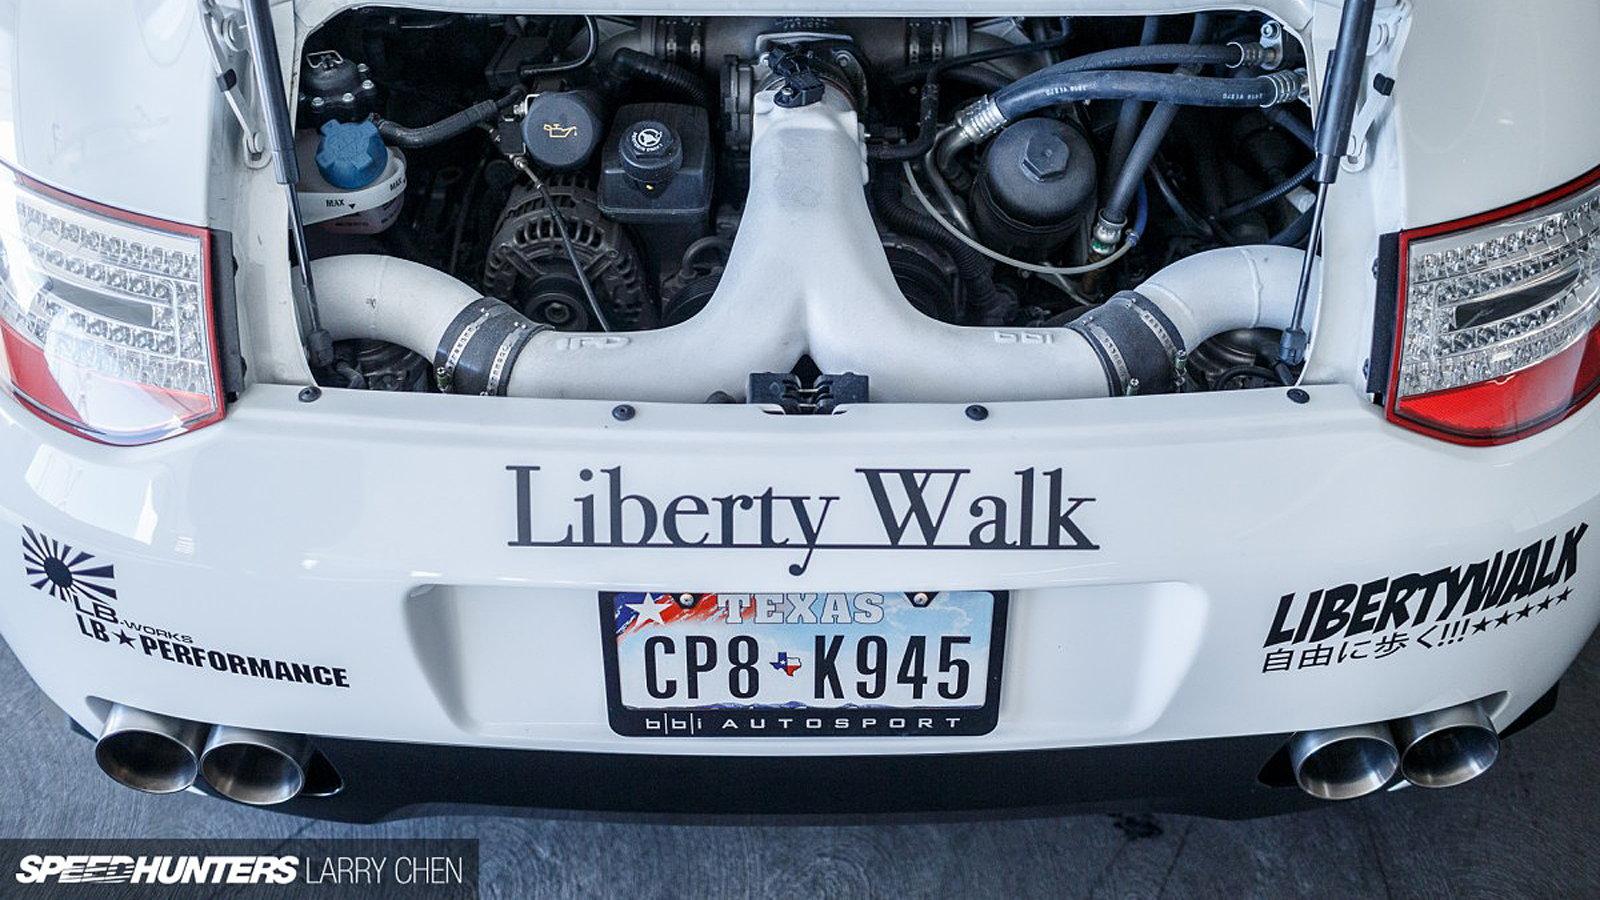 This 997 Doesn't Strut... It Liberty Walks